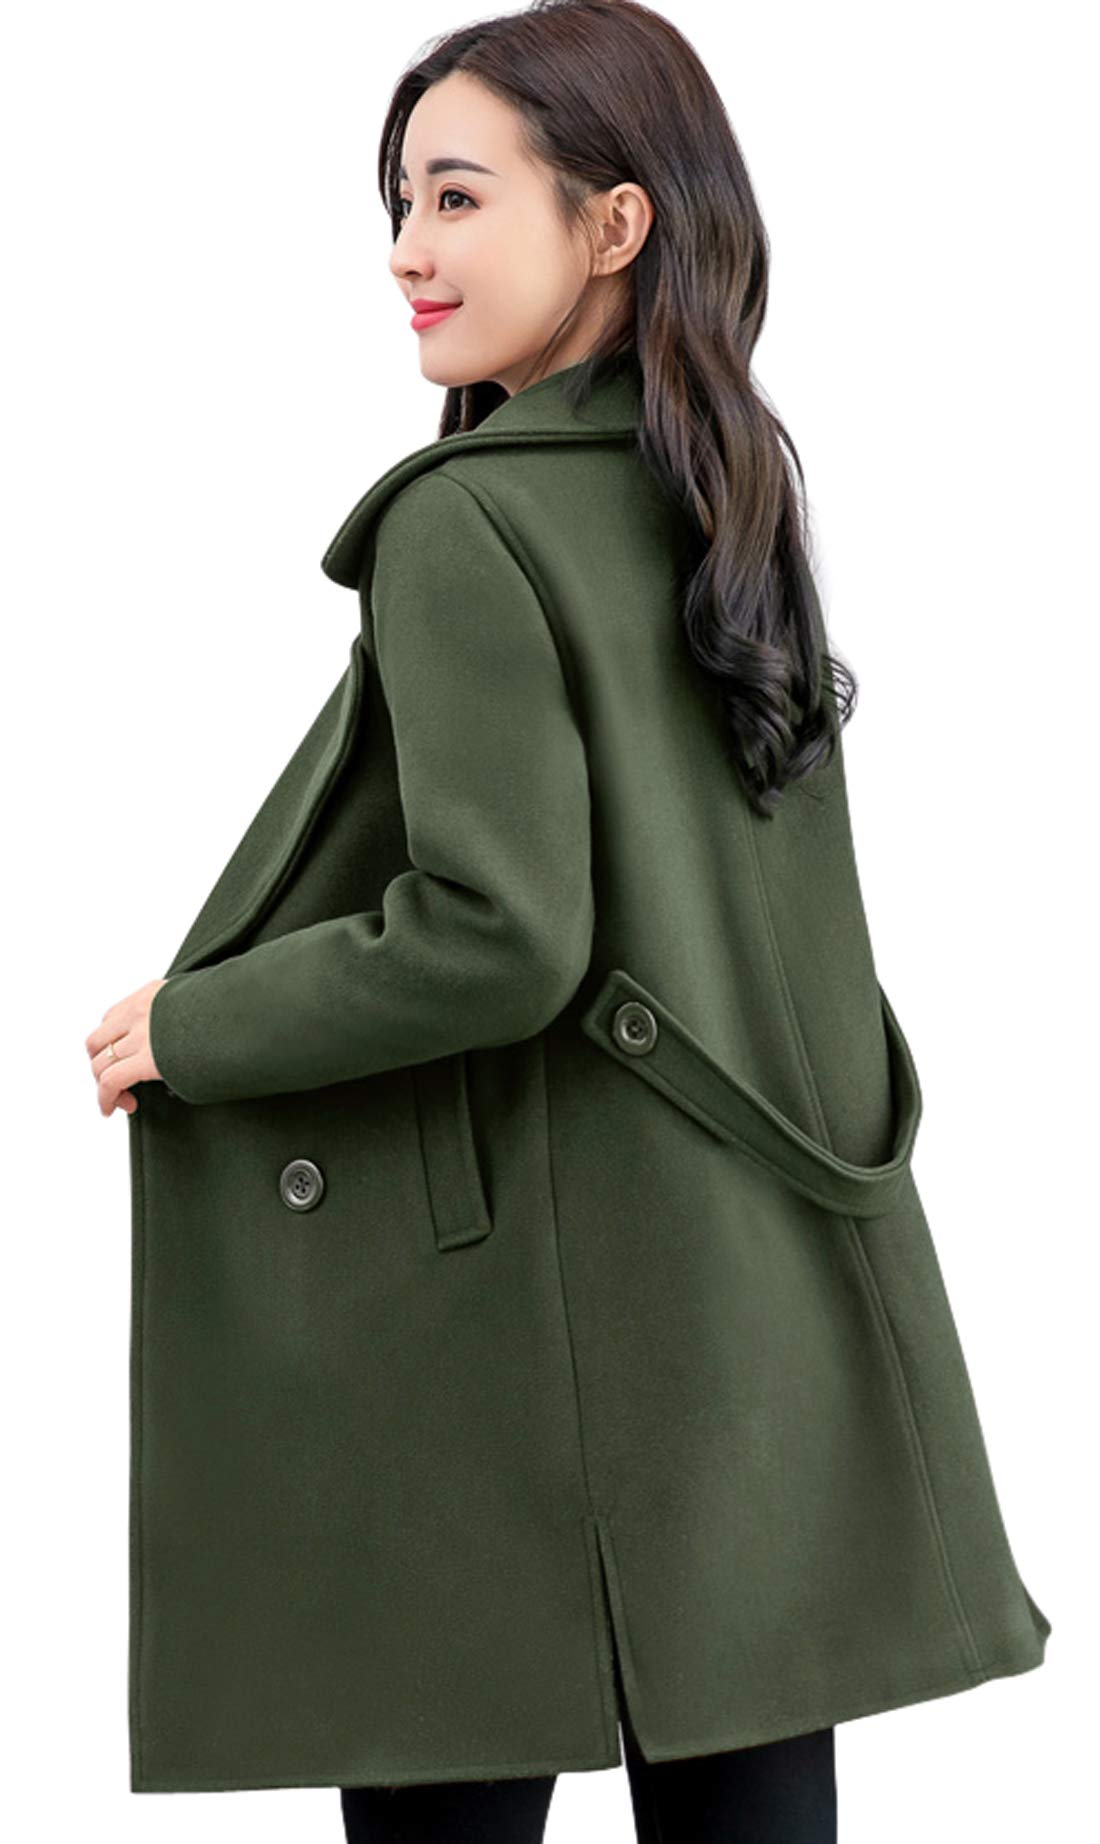 chouyatou Women's Elegant Lapel Collar Double Breasted Wool Blend Pea Coat with Belt